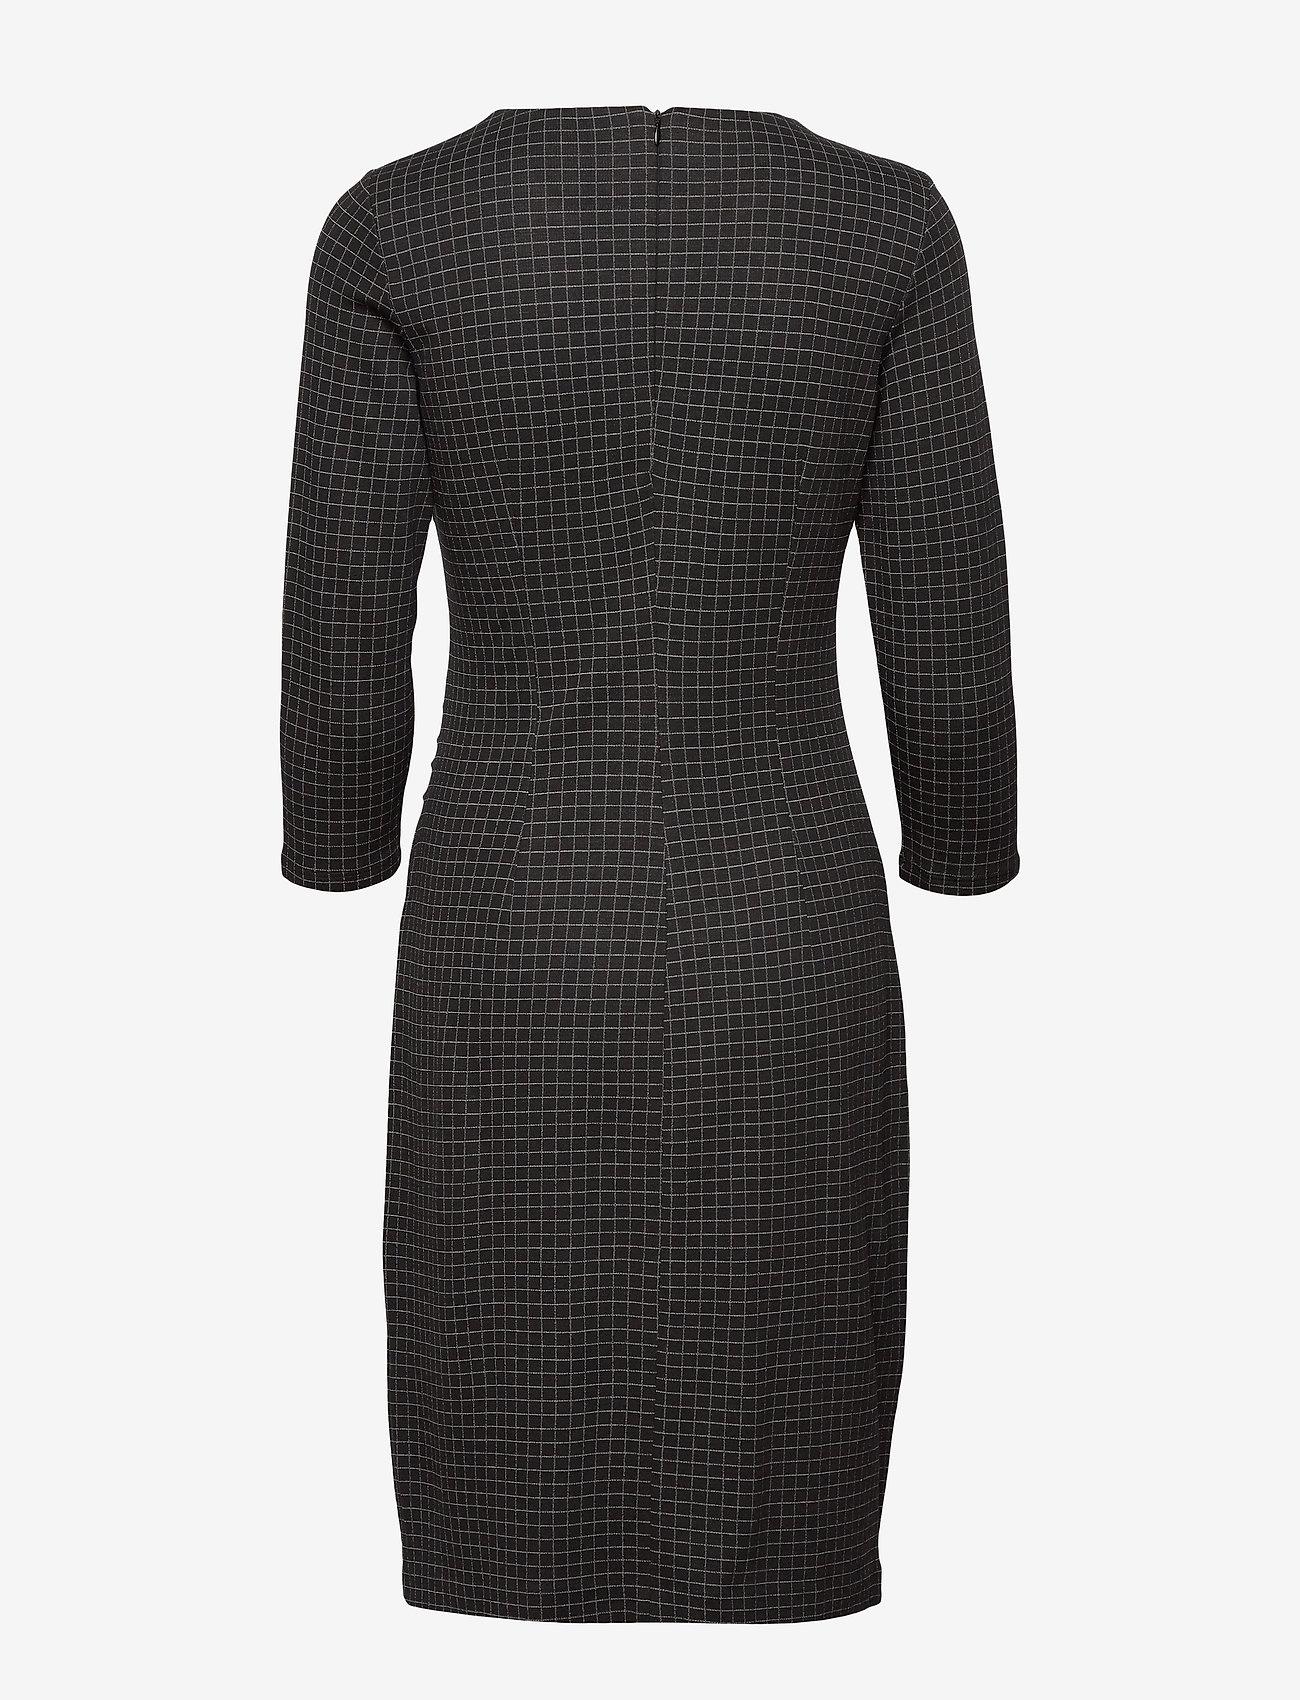 Särskild rabattDress Knitted Fabric Black/ Marzipan 779.35 Gerry Weber ZpSi1 t89dX